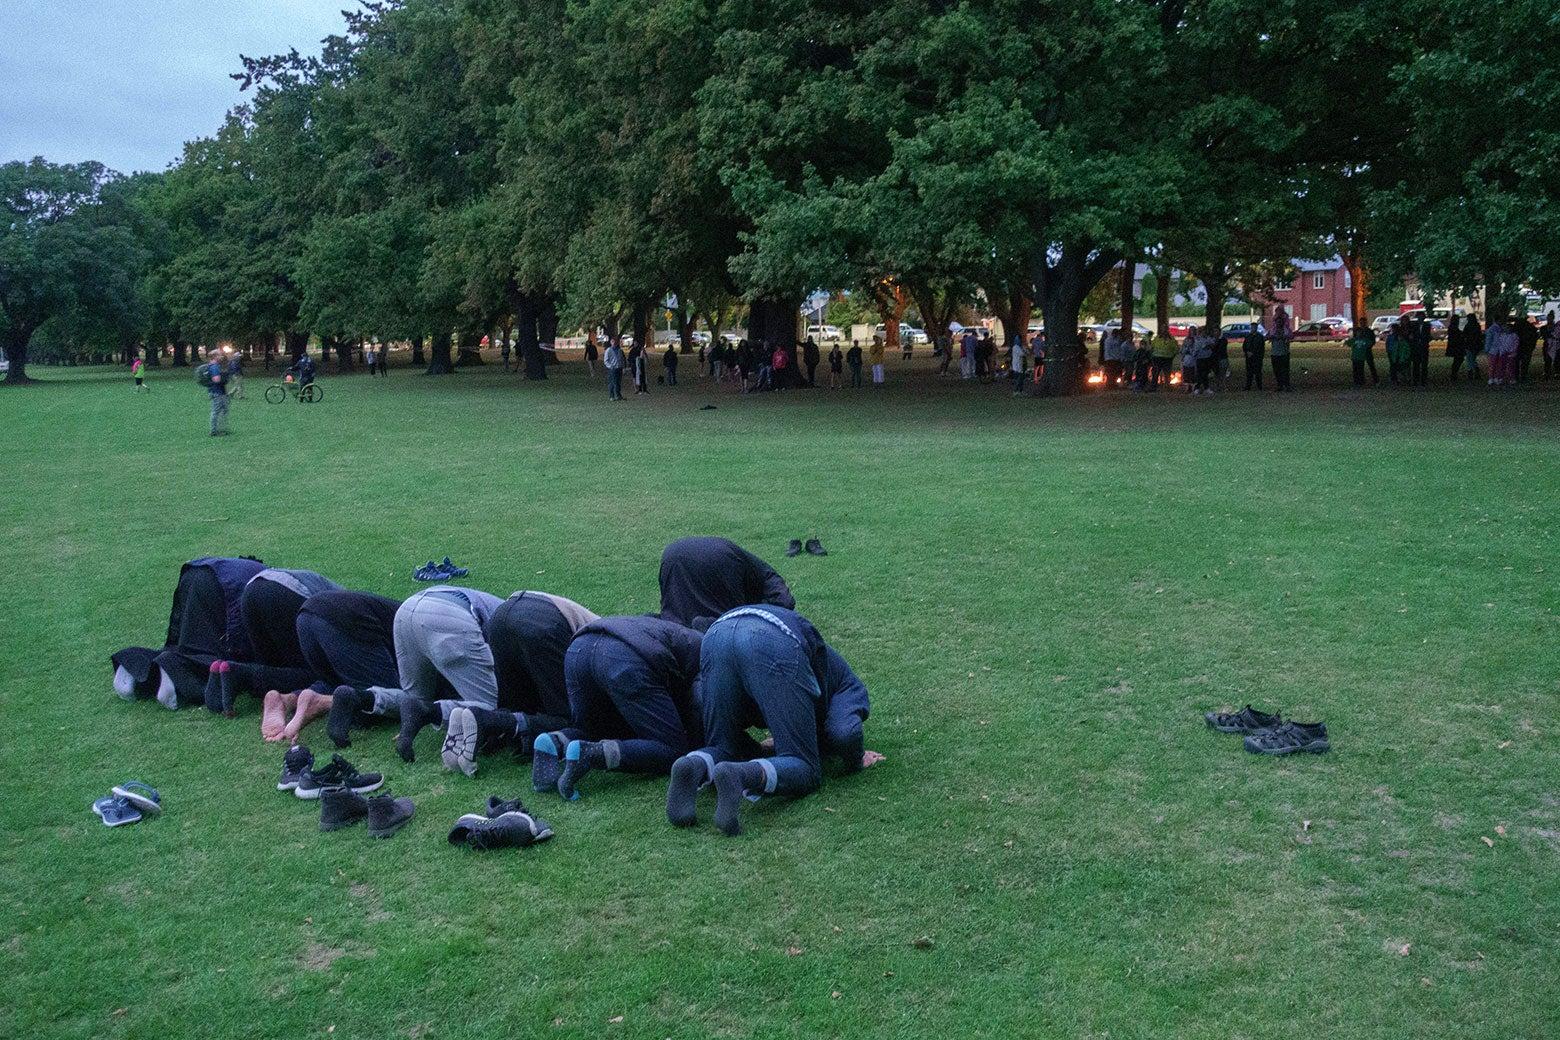 Eight men kneel to pray in a park.